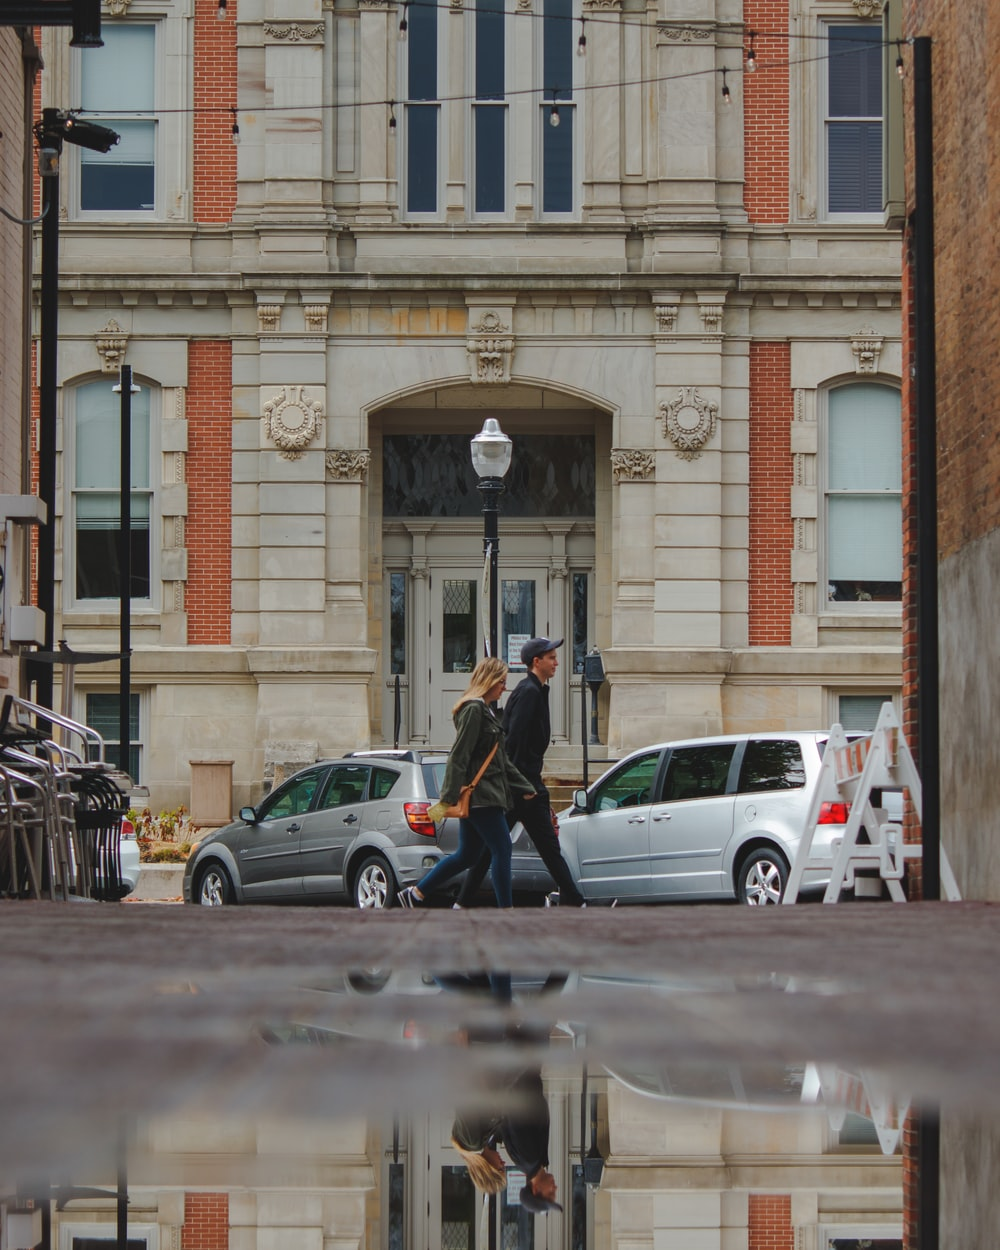 man in black jacket walking on sidewalk near cars parked beside brown building during daytime